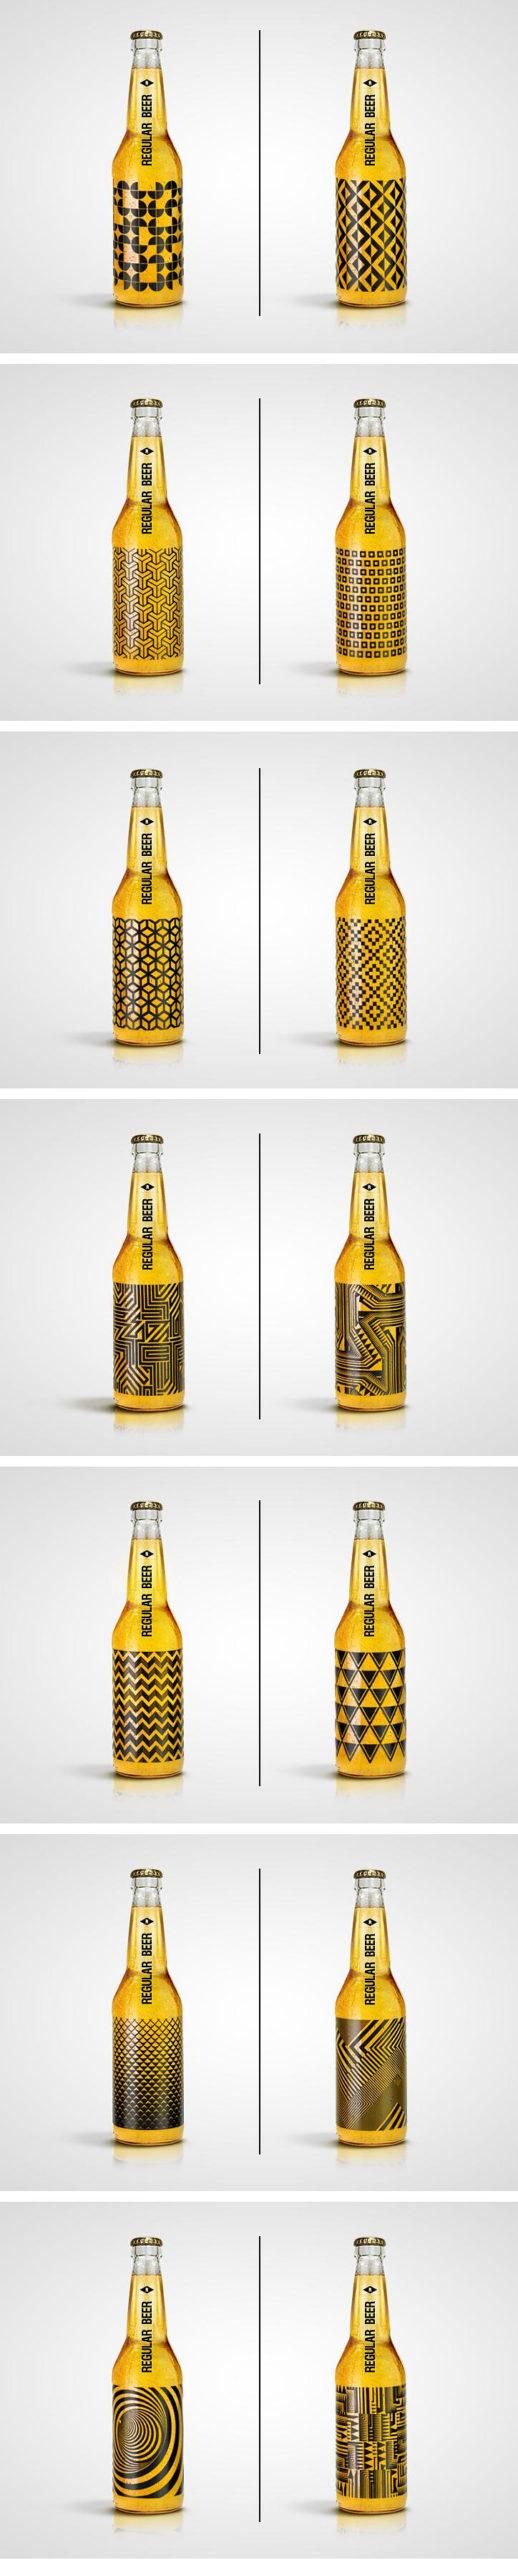 Regular Beer by Kamil Piatkowski.